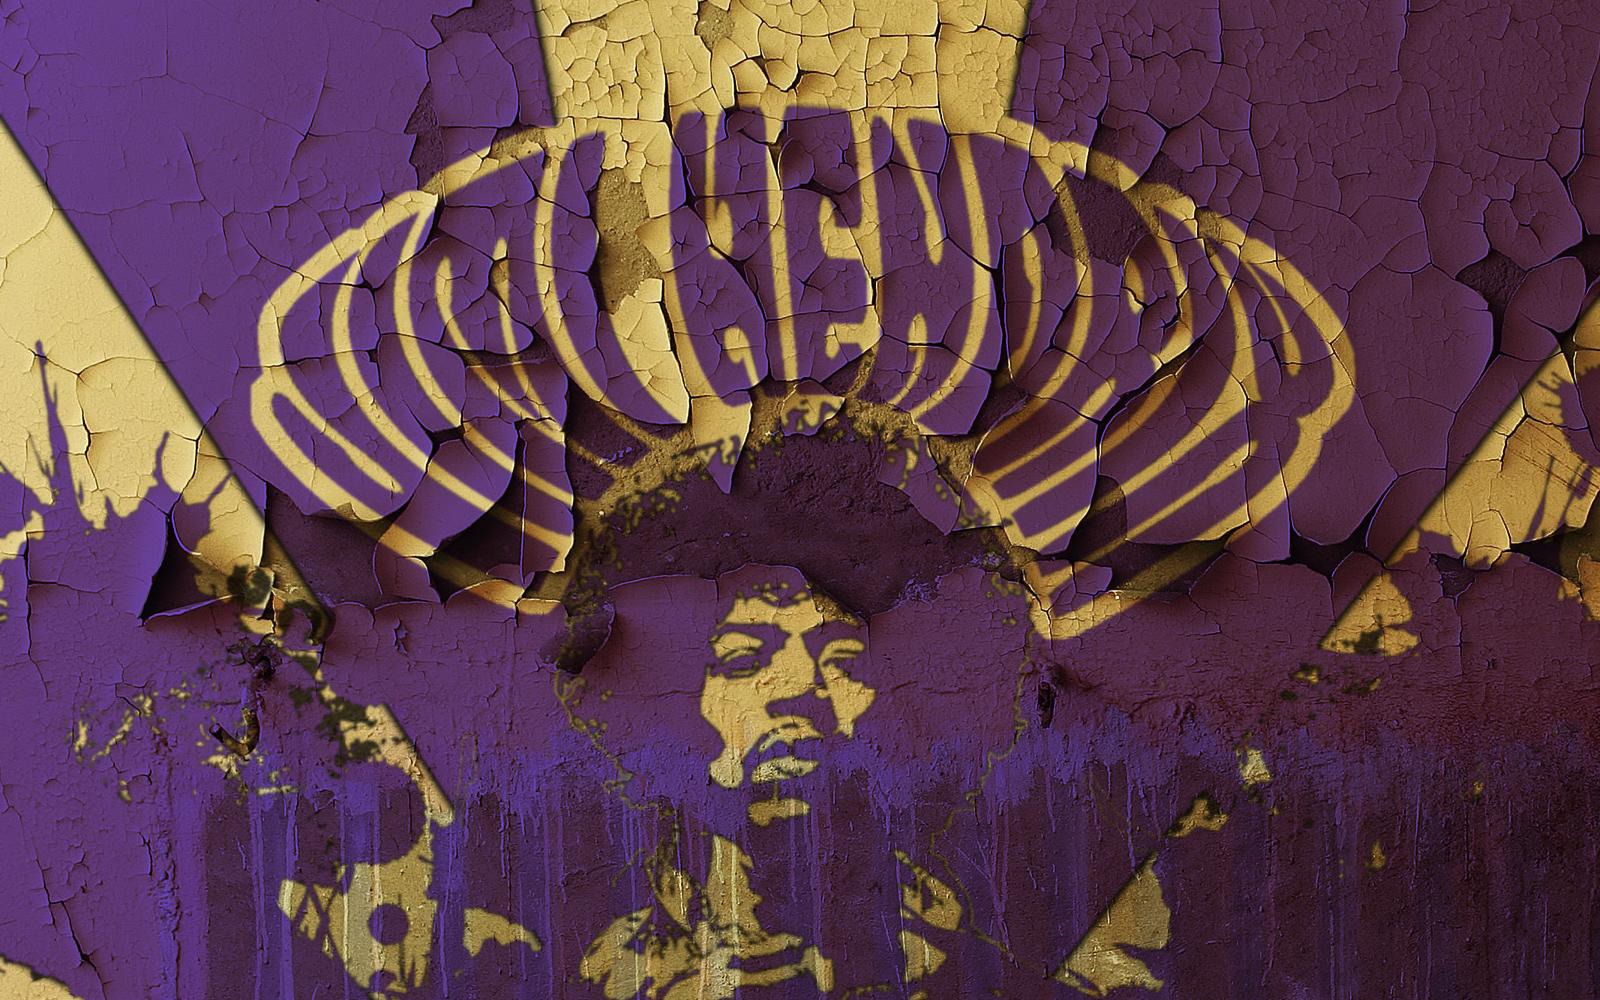 Jimi hendrix iphone wallpaper wallpapersafari - Jimi hendrix wallpaper psychedelic ...